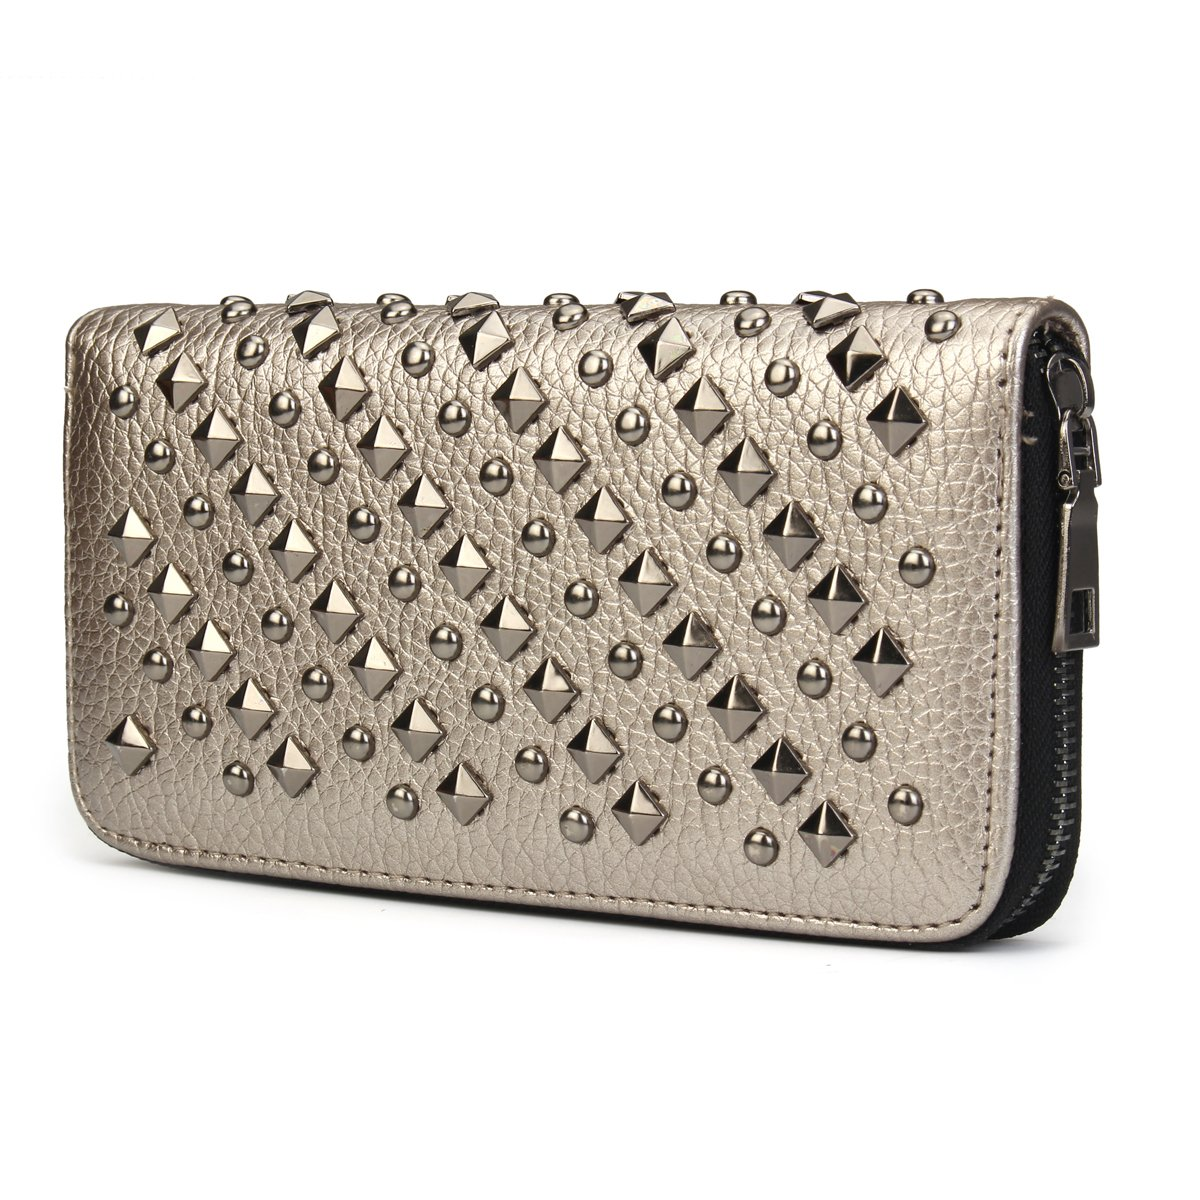 OURBAG Cool Fashion Women Punk Style Spike Handbag Rivet Studded Long Wallet Phone Bag Gray Medium